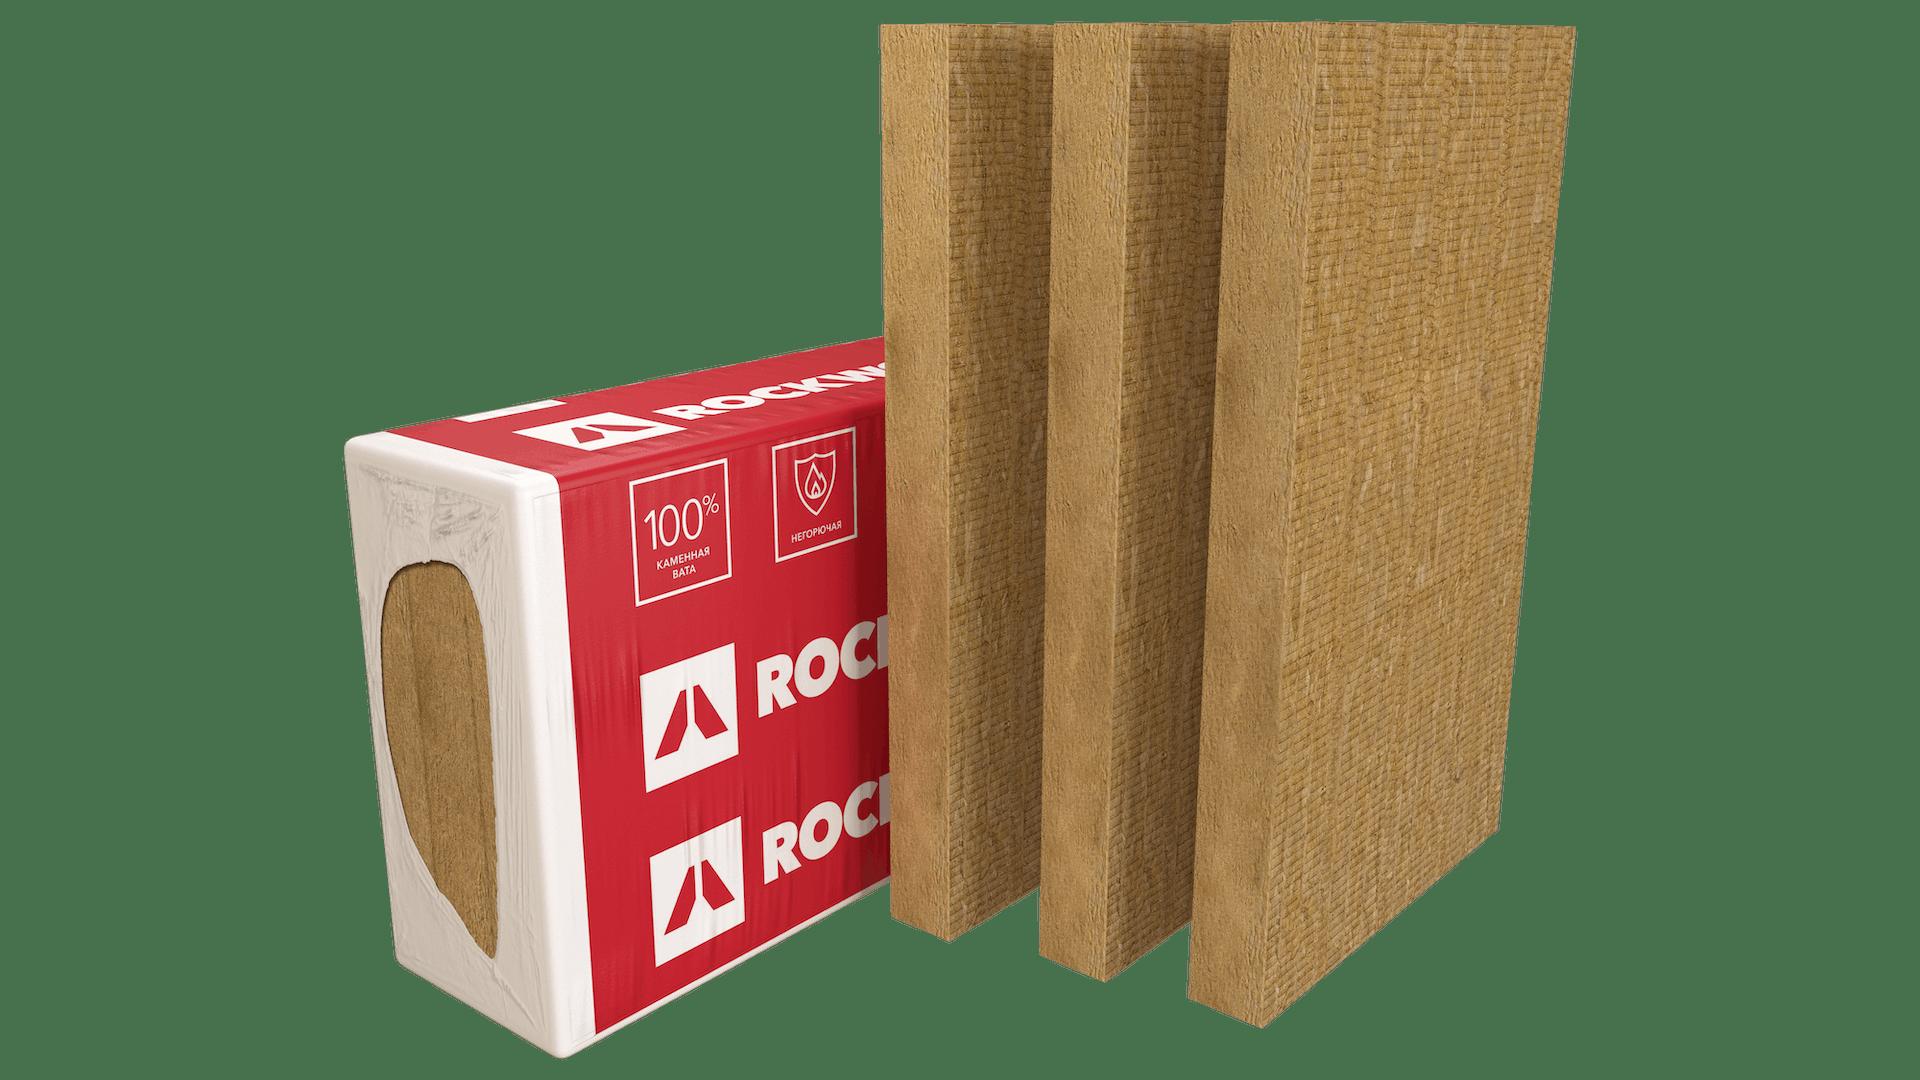 RUF BATTS N EXTRA, RUF BATTS, roof, roof insulation